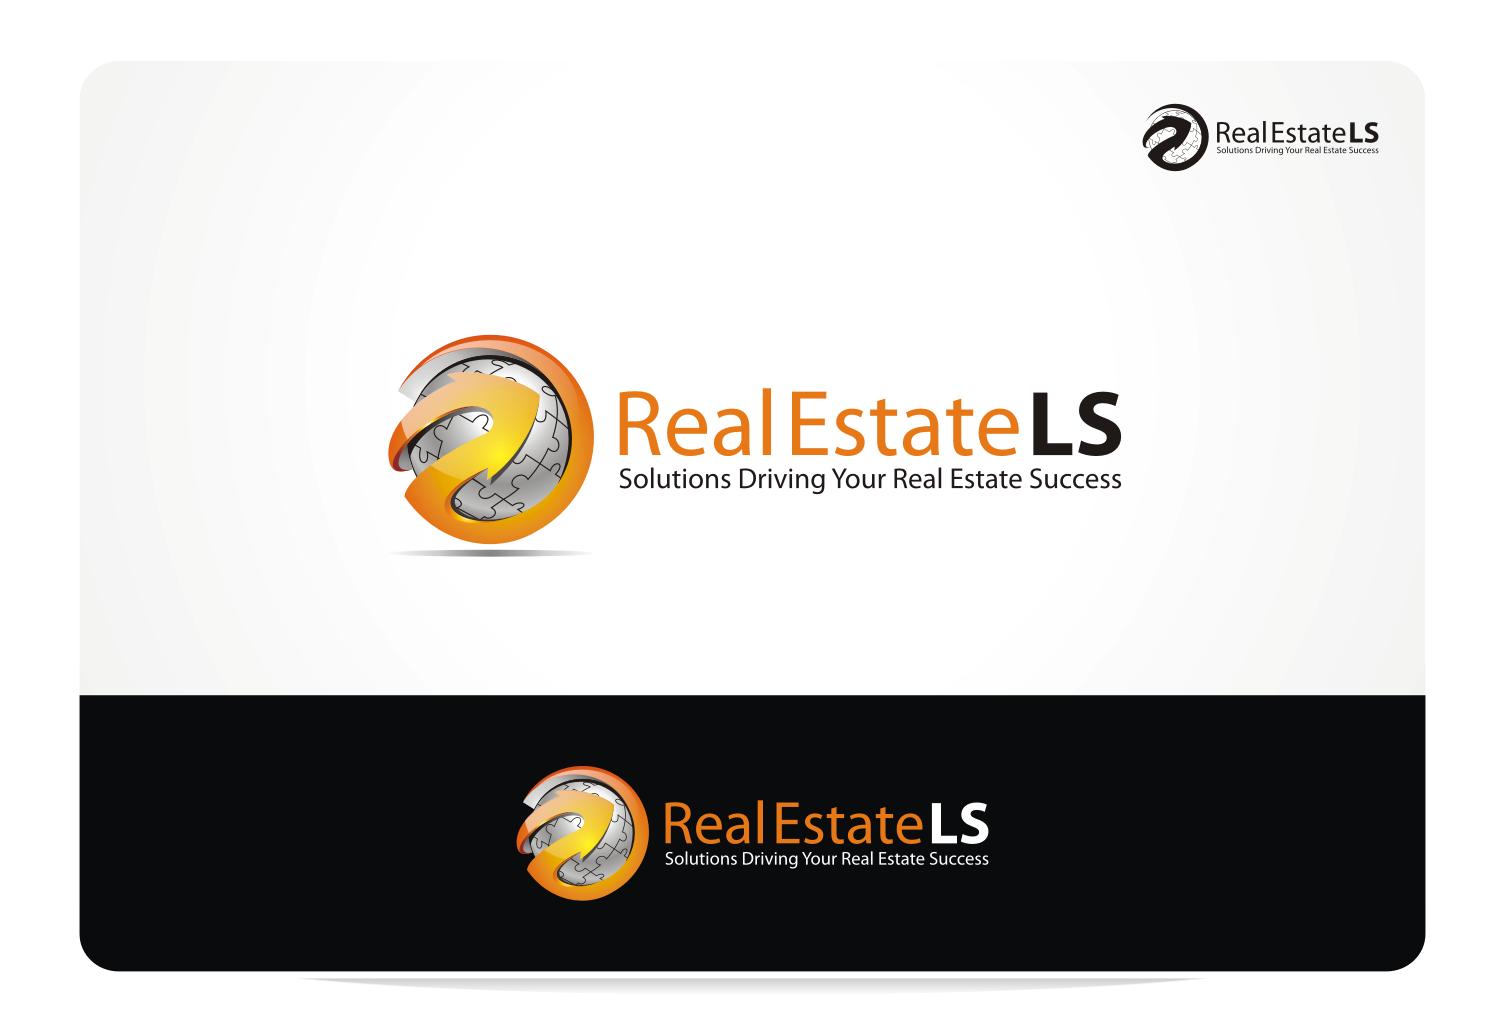 Real Estate LS needs a new logo